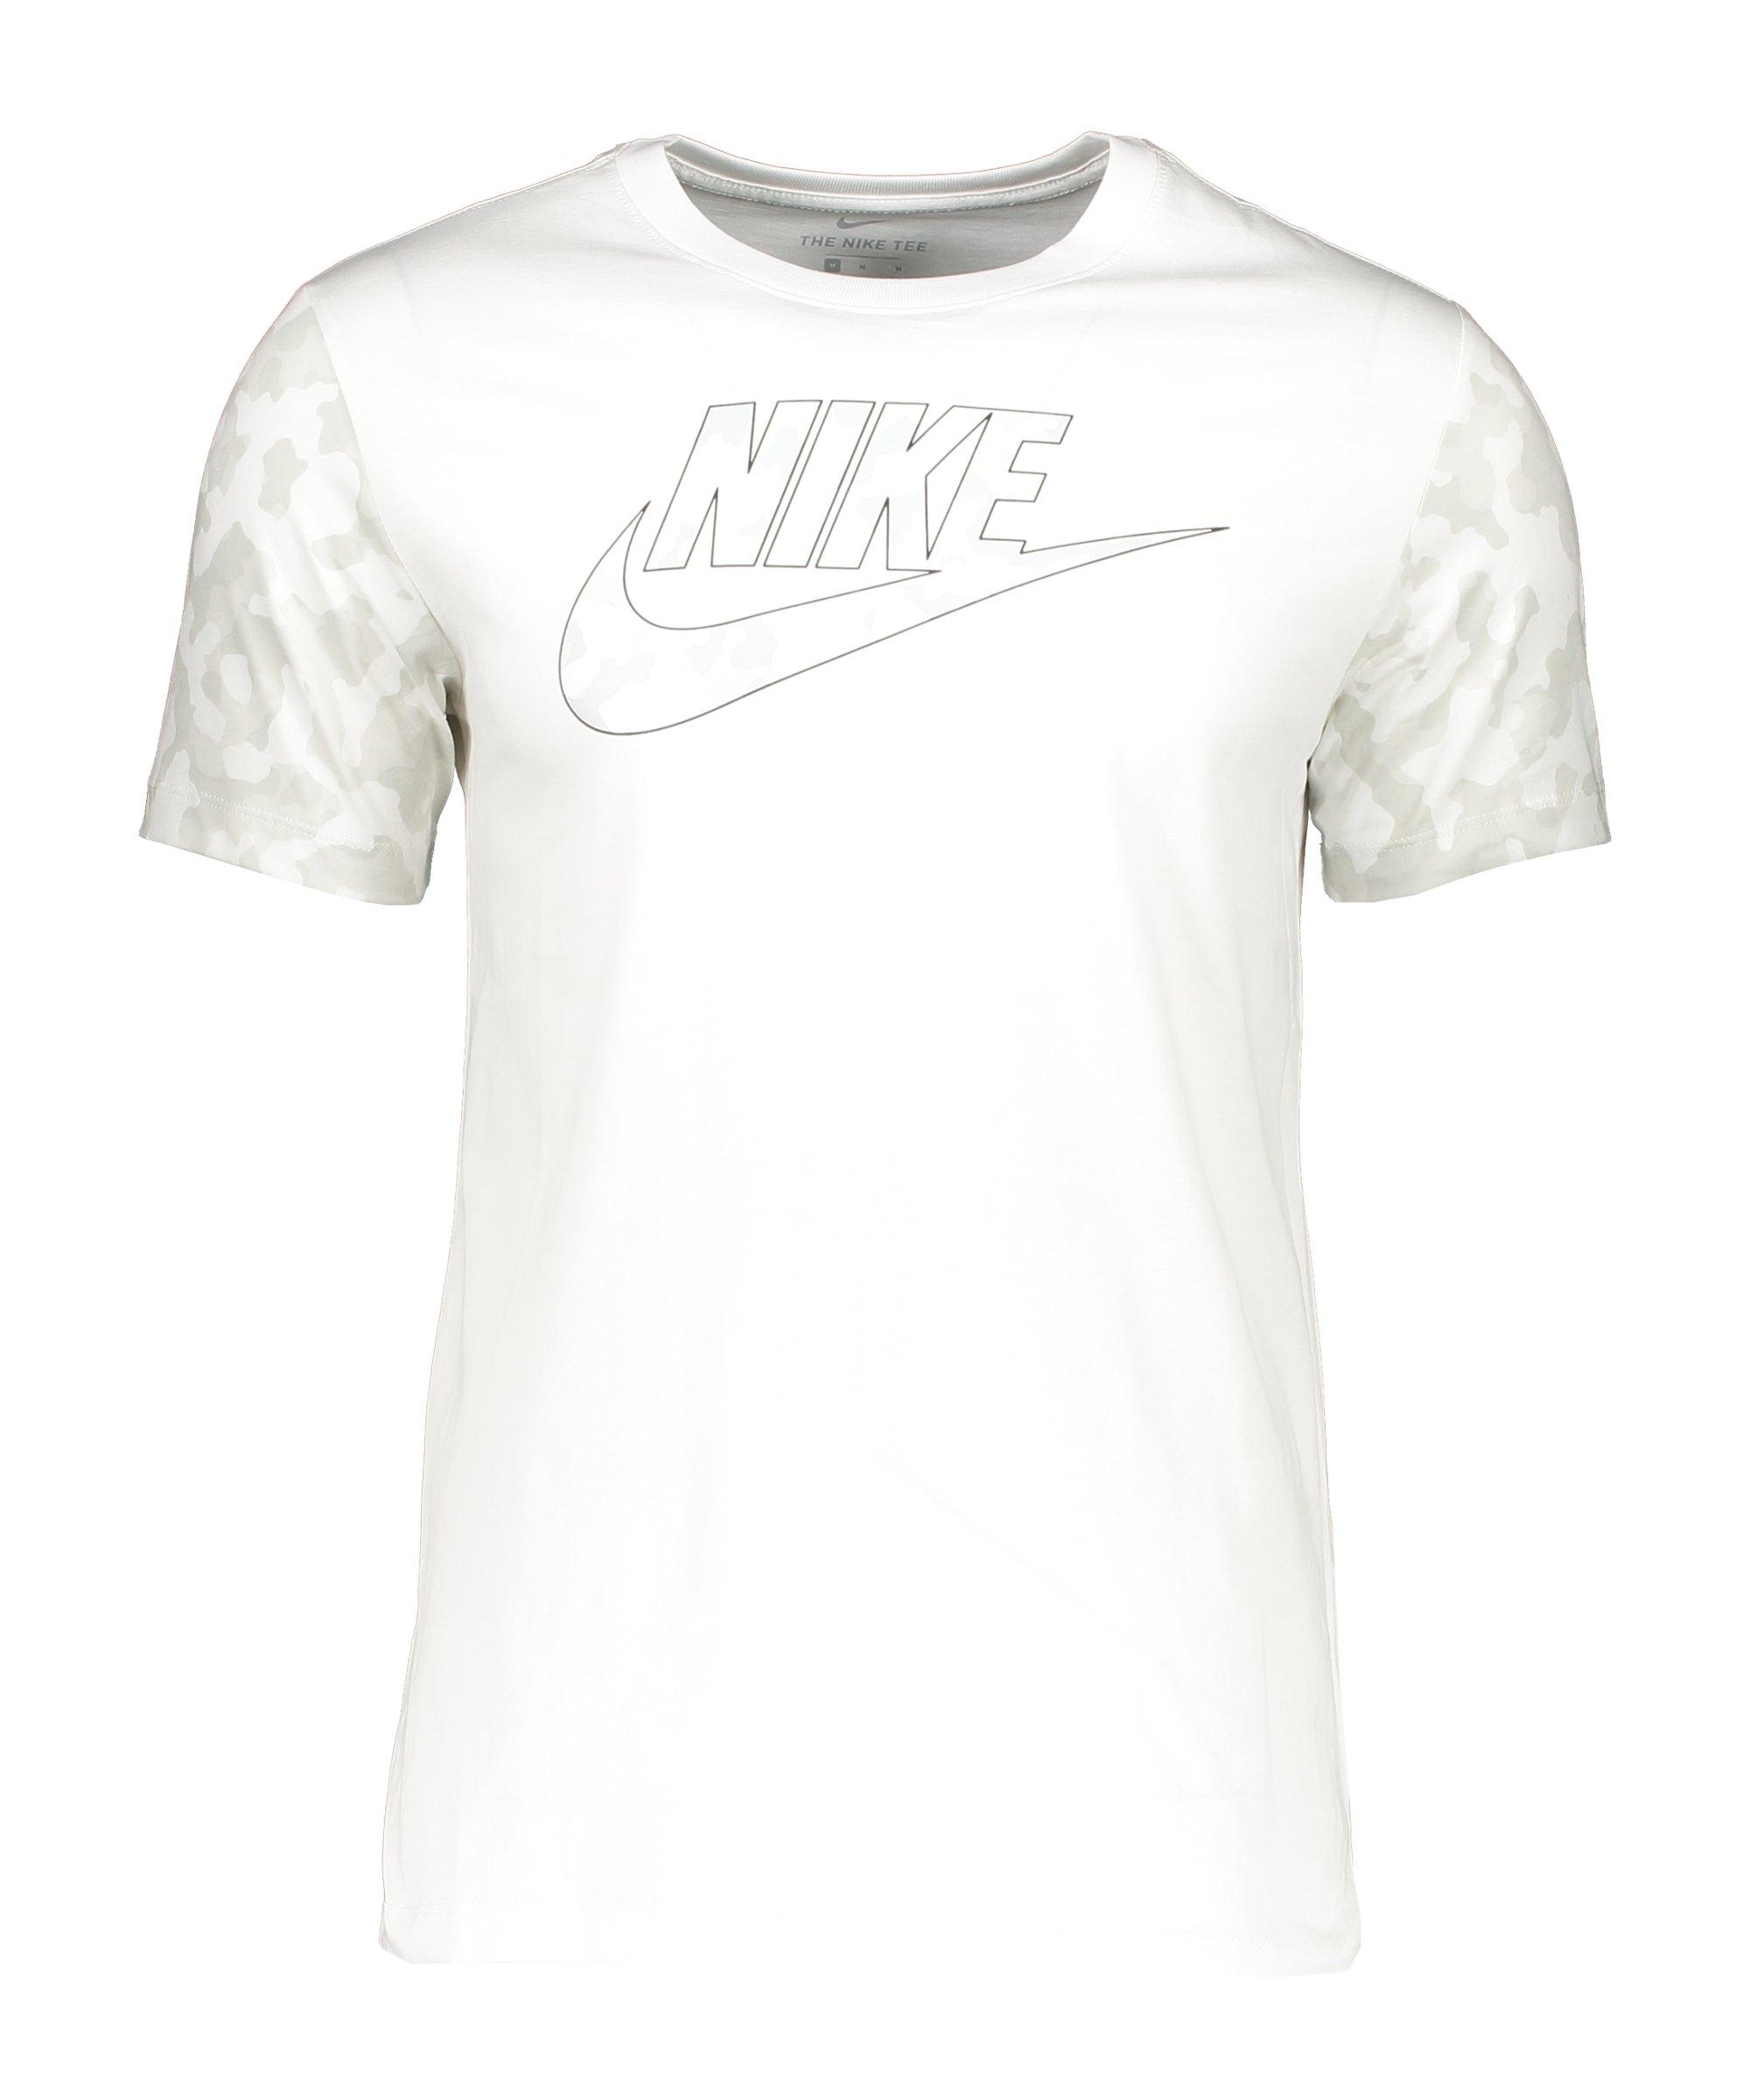 Nike Classic Graphic Camo T-Shirt Weiss F121 - weiss